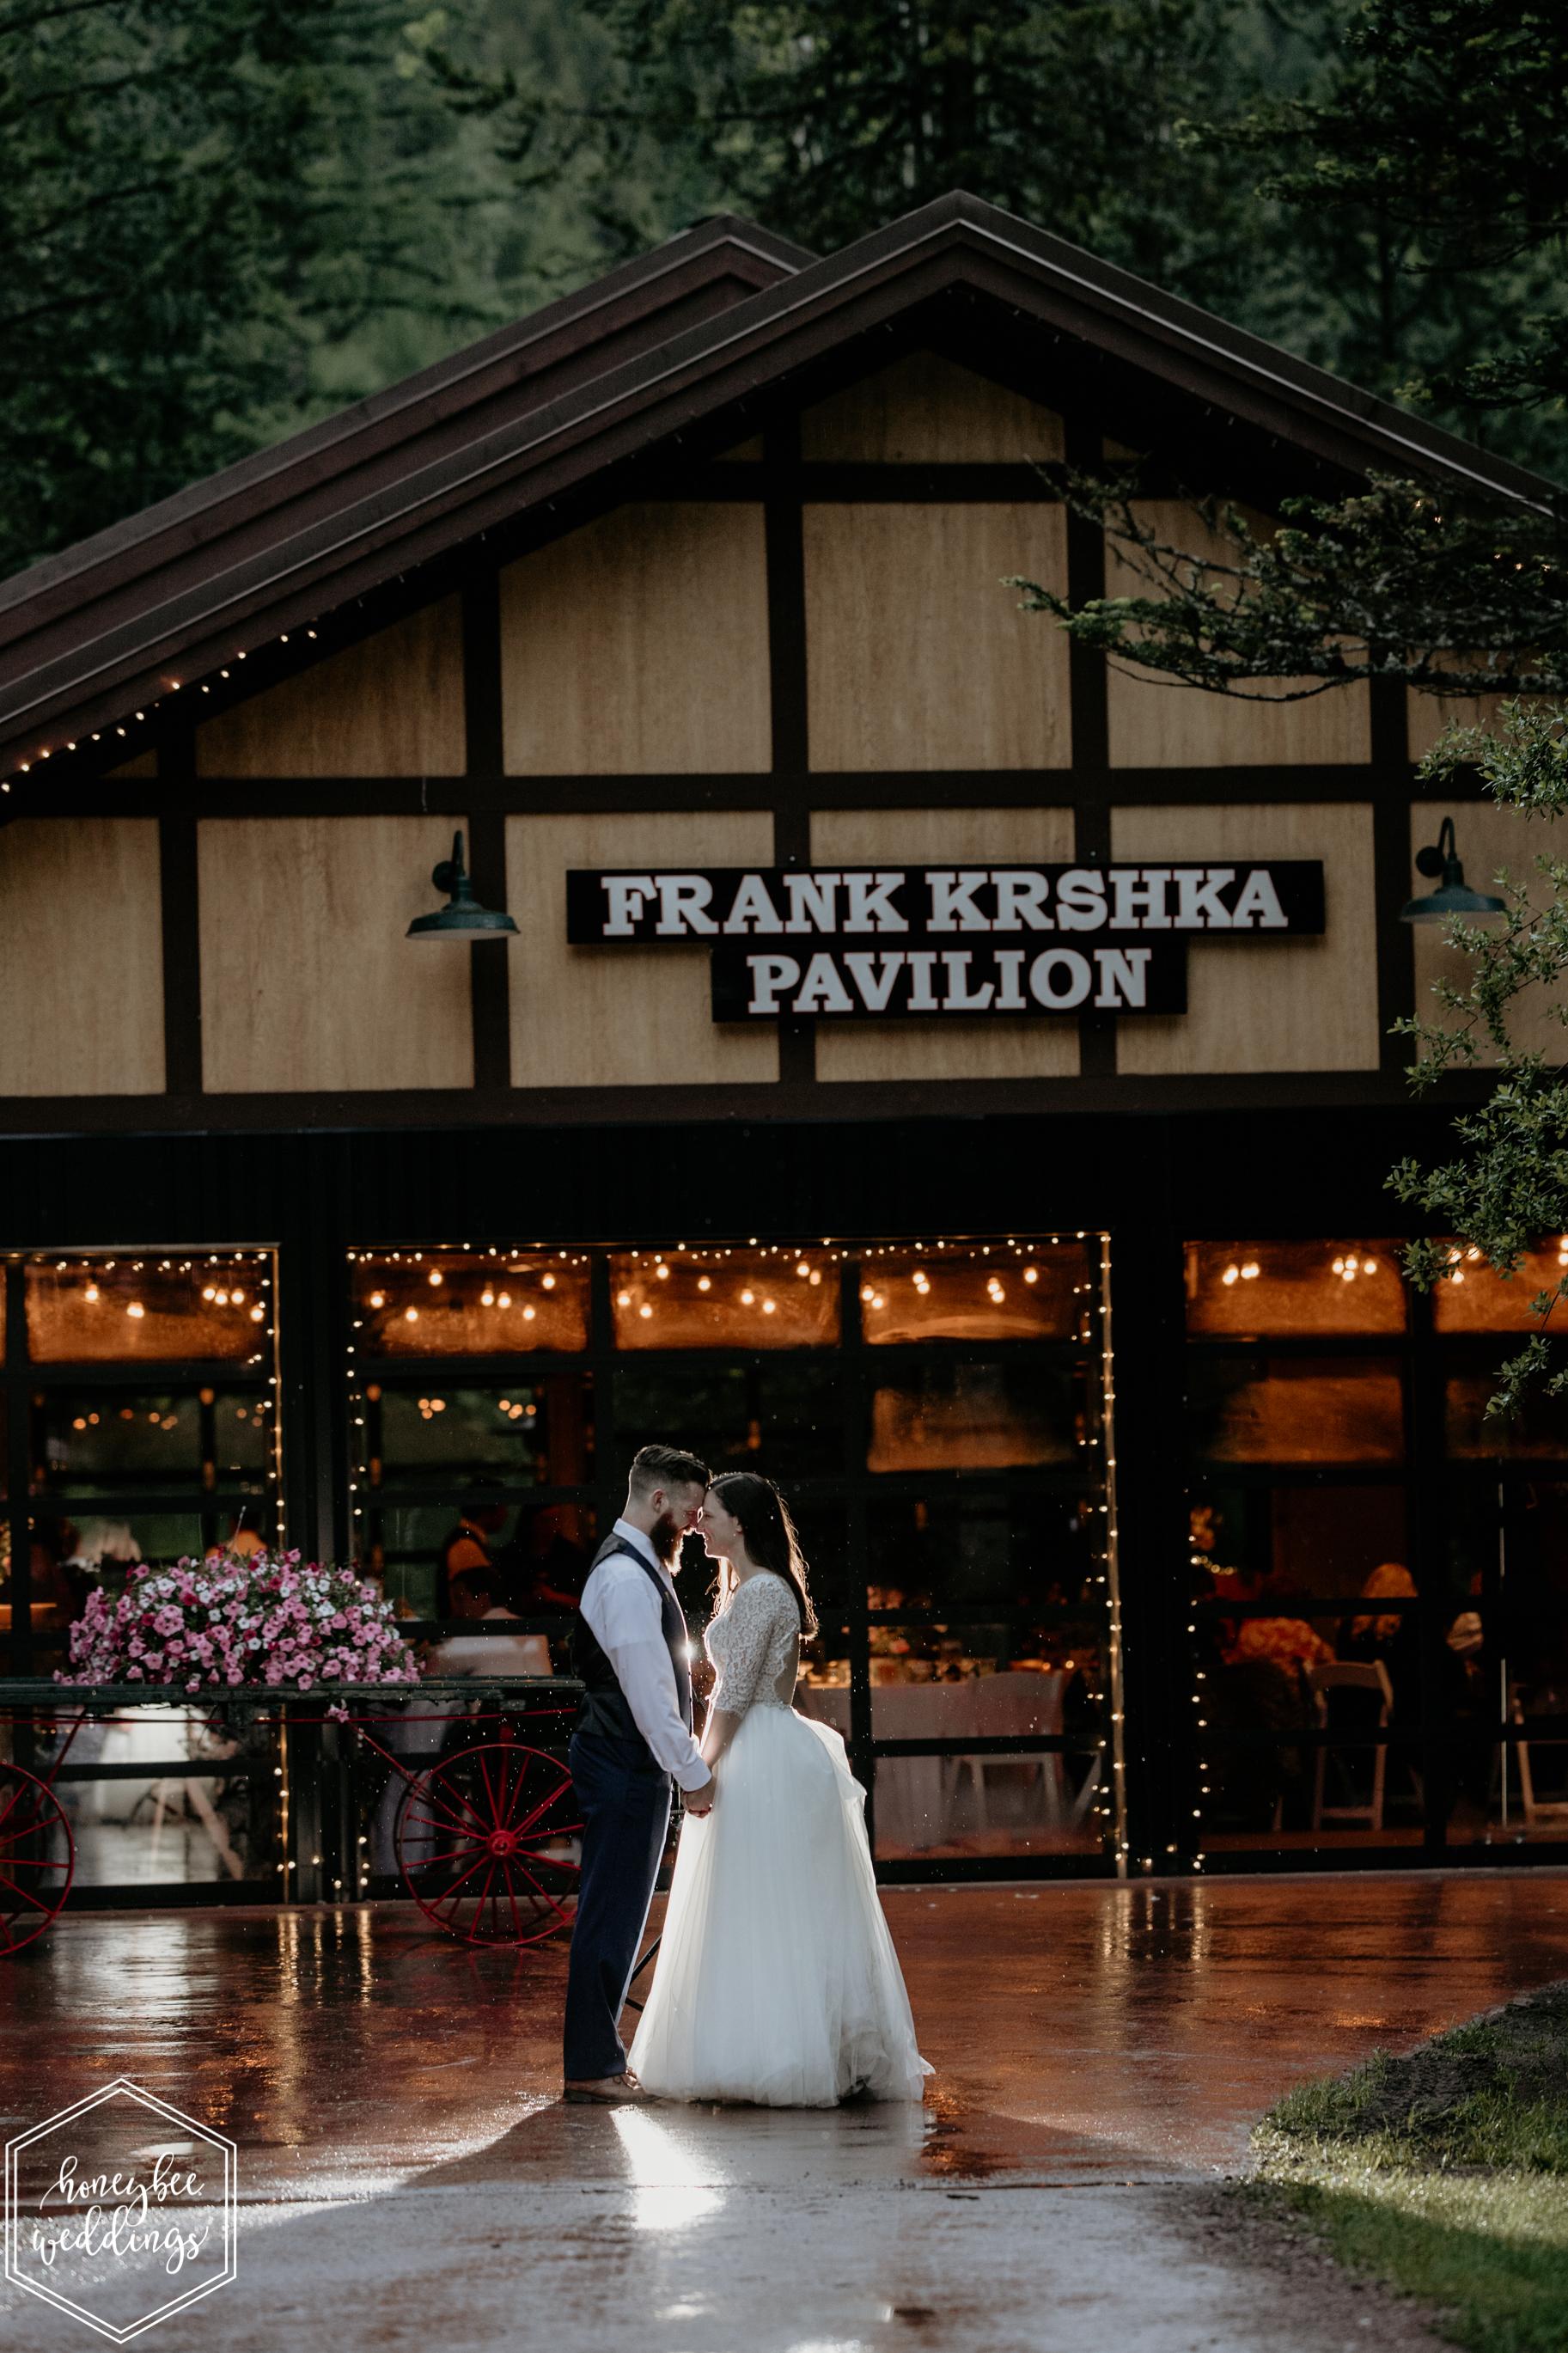 199Glacier National Park Wedding_Izaak Walton Inn Wedding_Honeybee Weddings_Norah & Kyle_June 08, 2019-2914.jpg